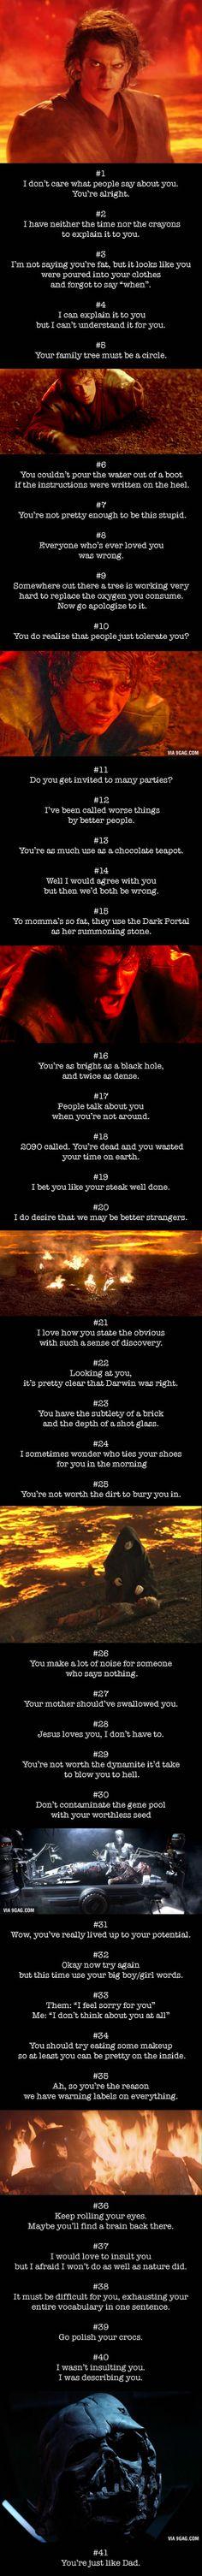 41 Curse-Free Comebacks That Burn Like Fire